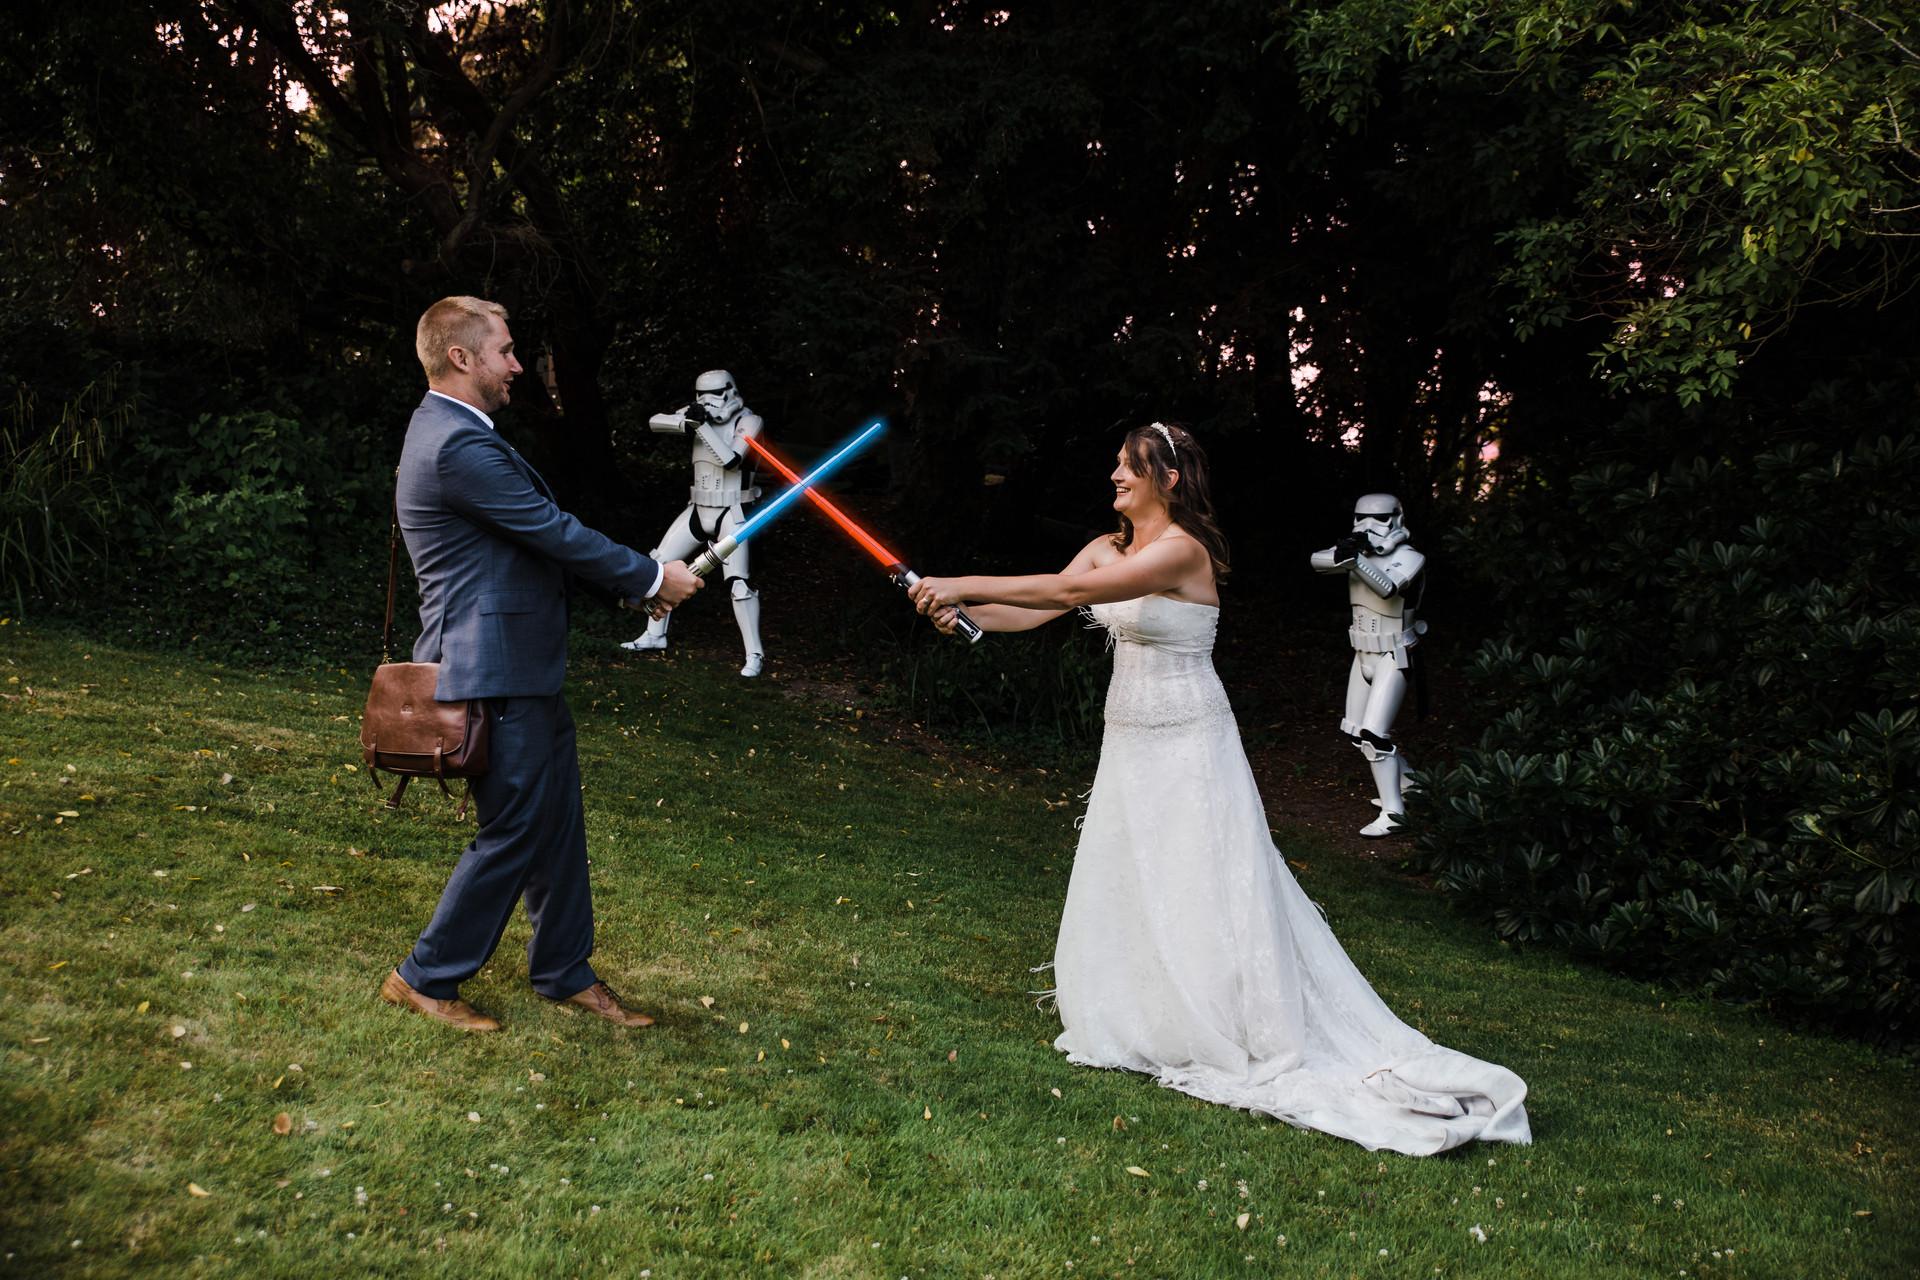 Star Wars Wedding Isle of Wight